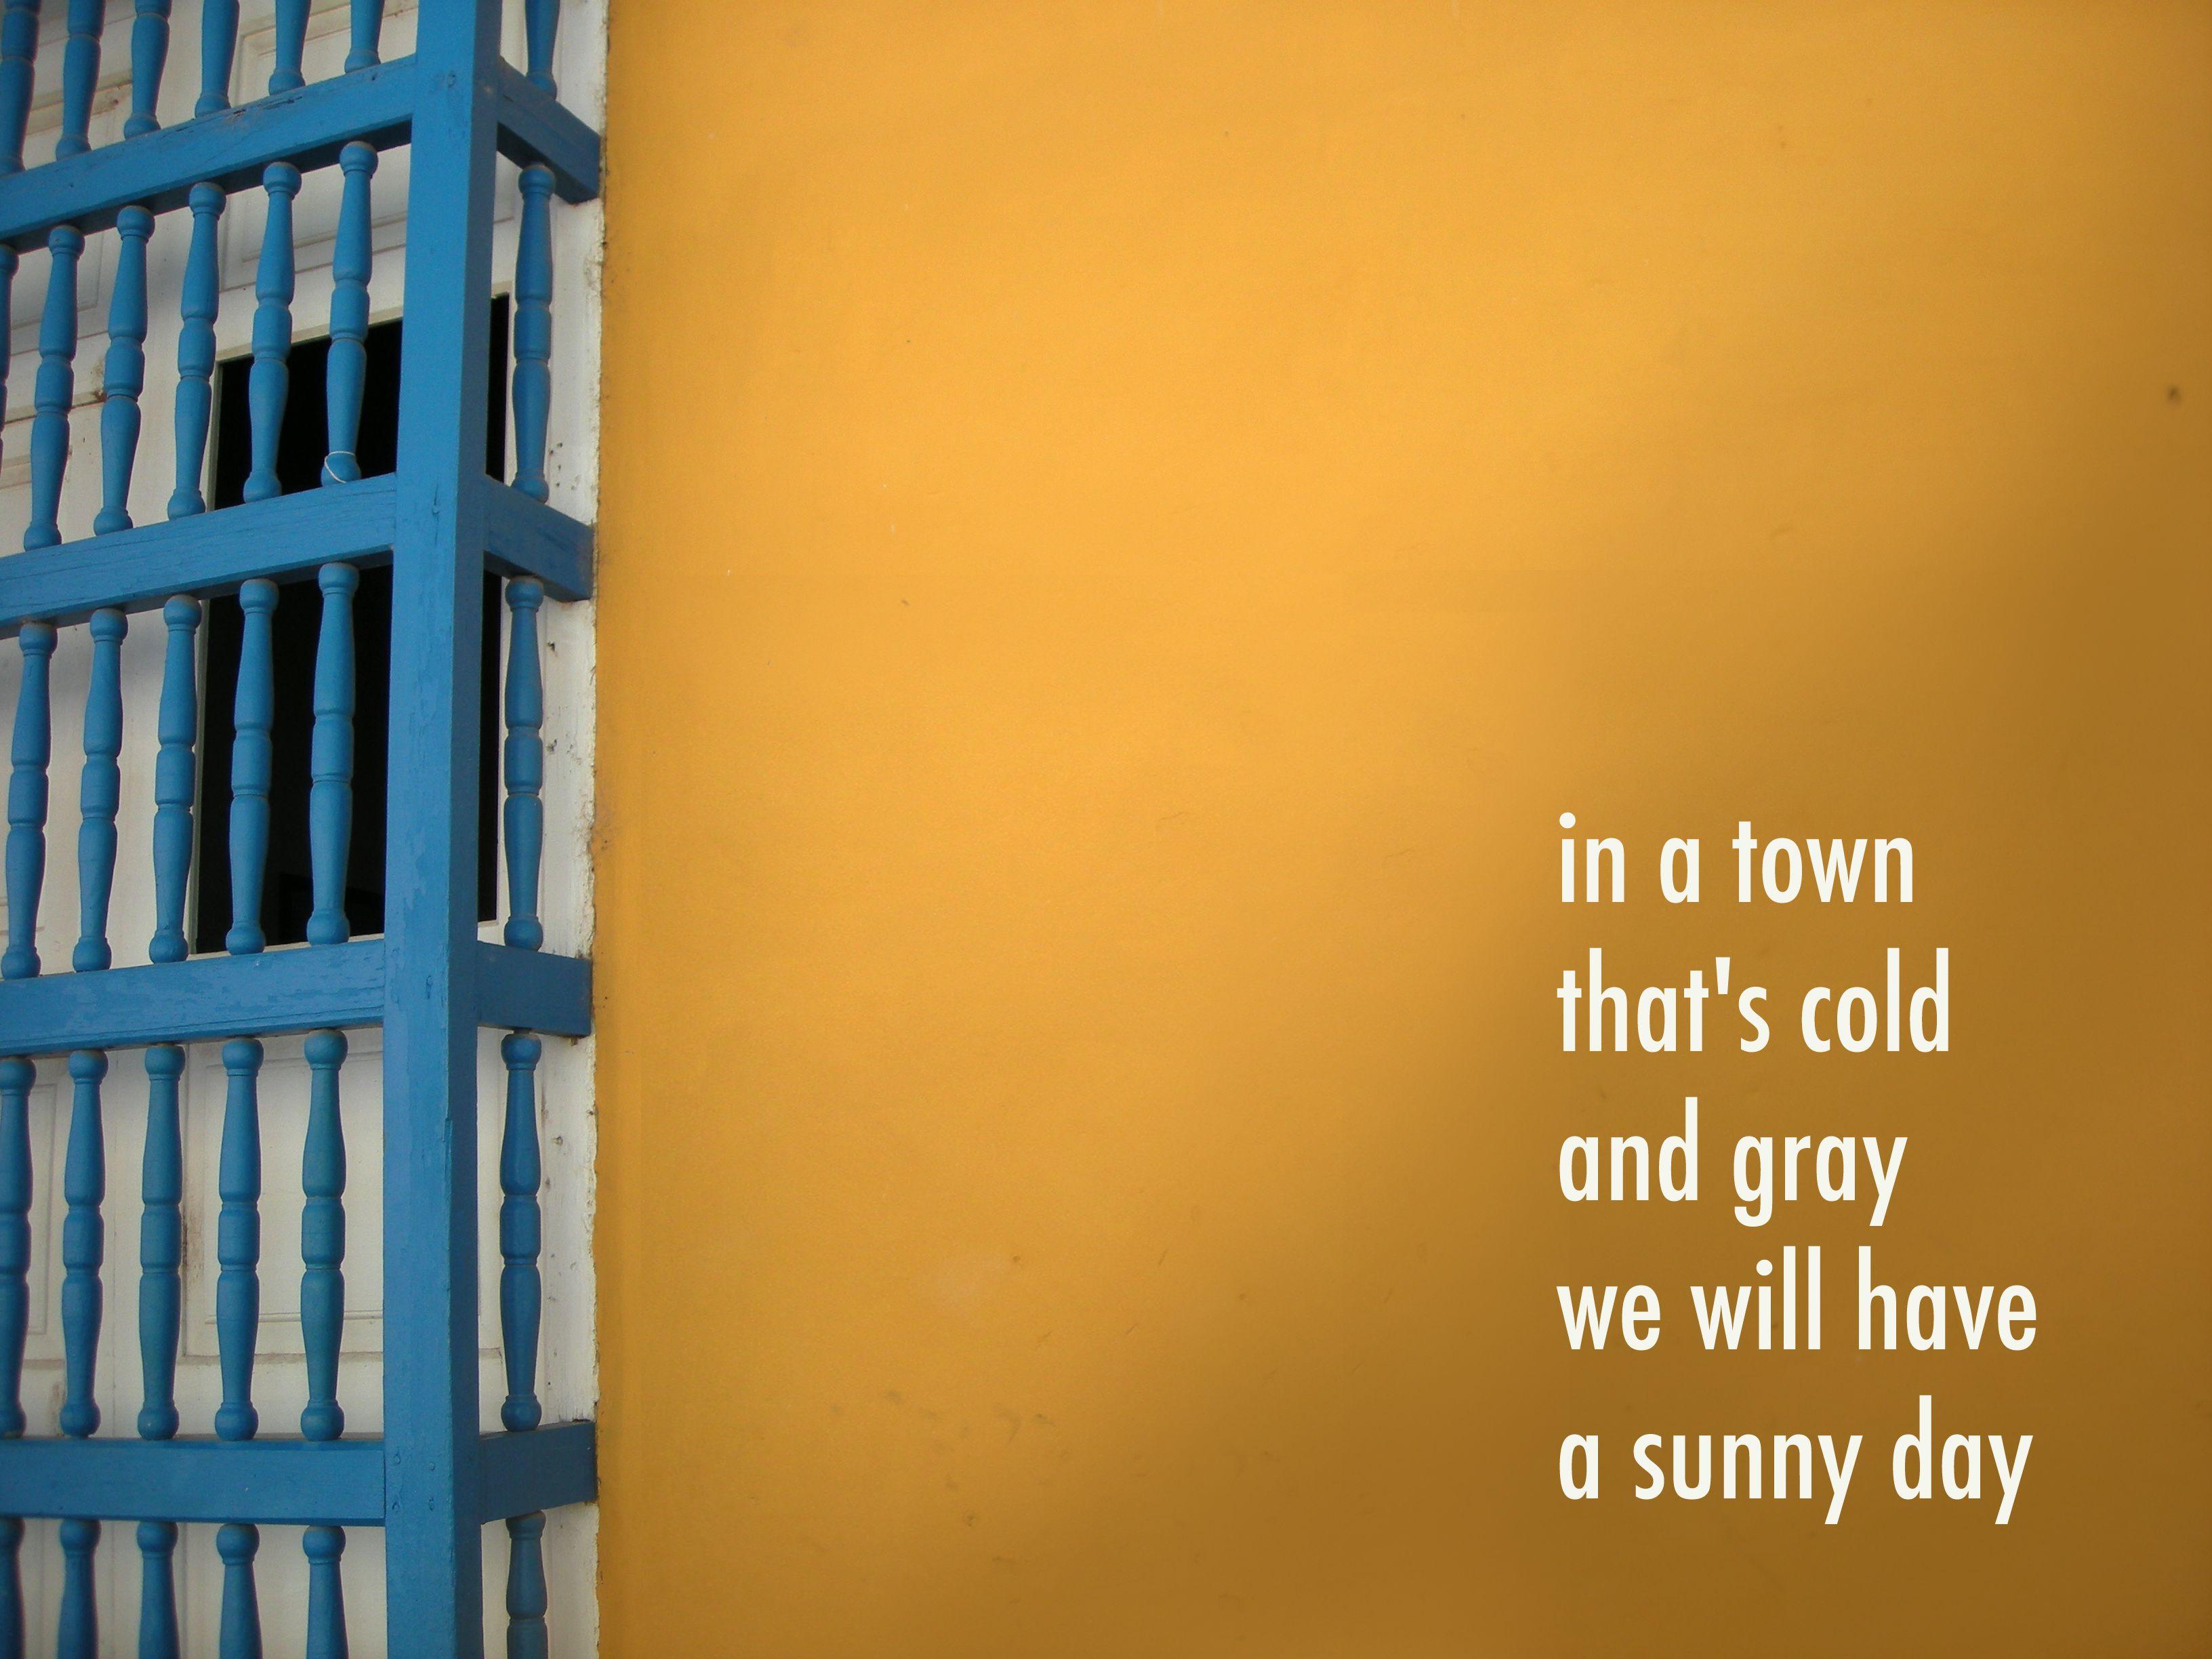 Folding Chair Regina Spektor Lyrics Black Plastic Chairs Raindrops Russia Dreams Pinterest